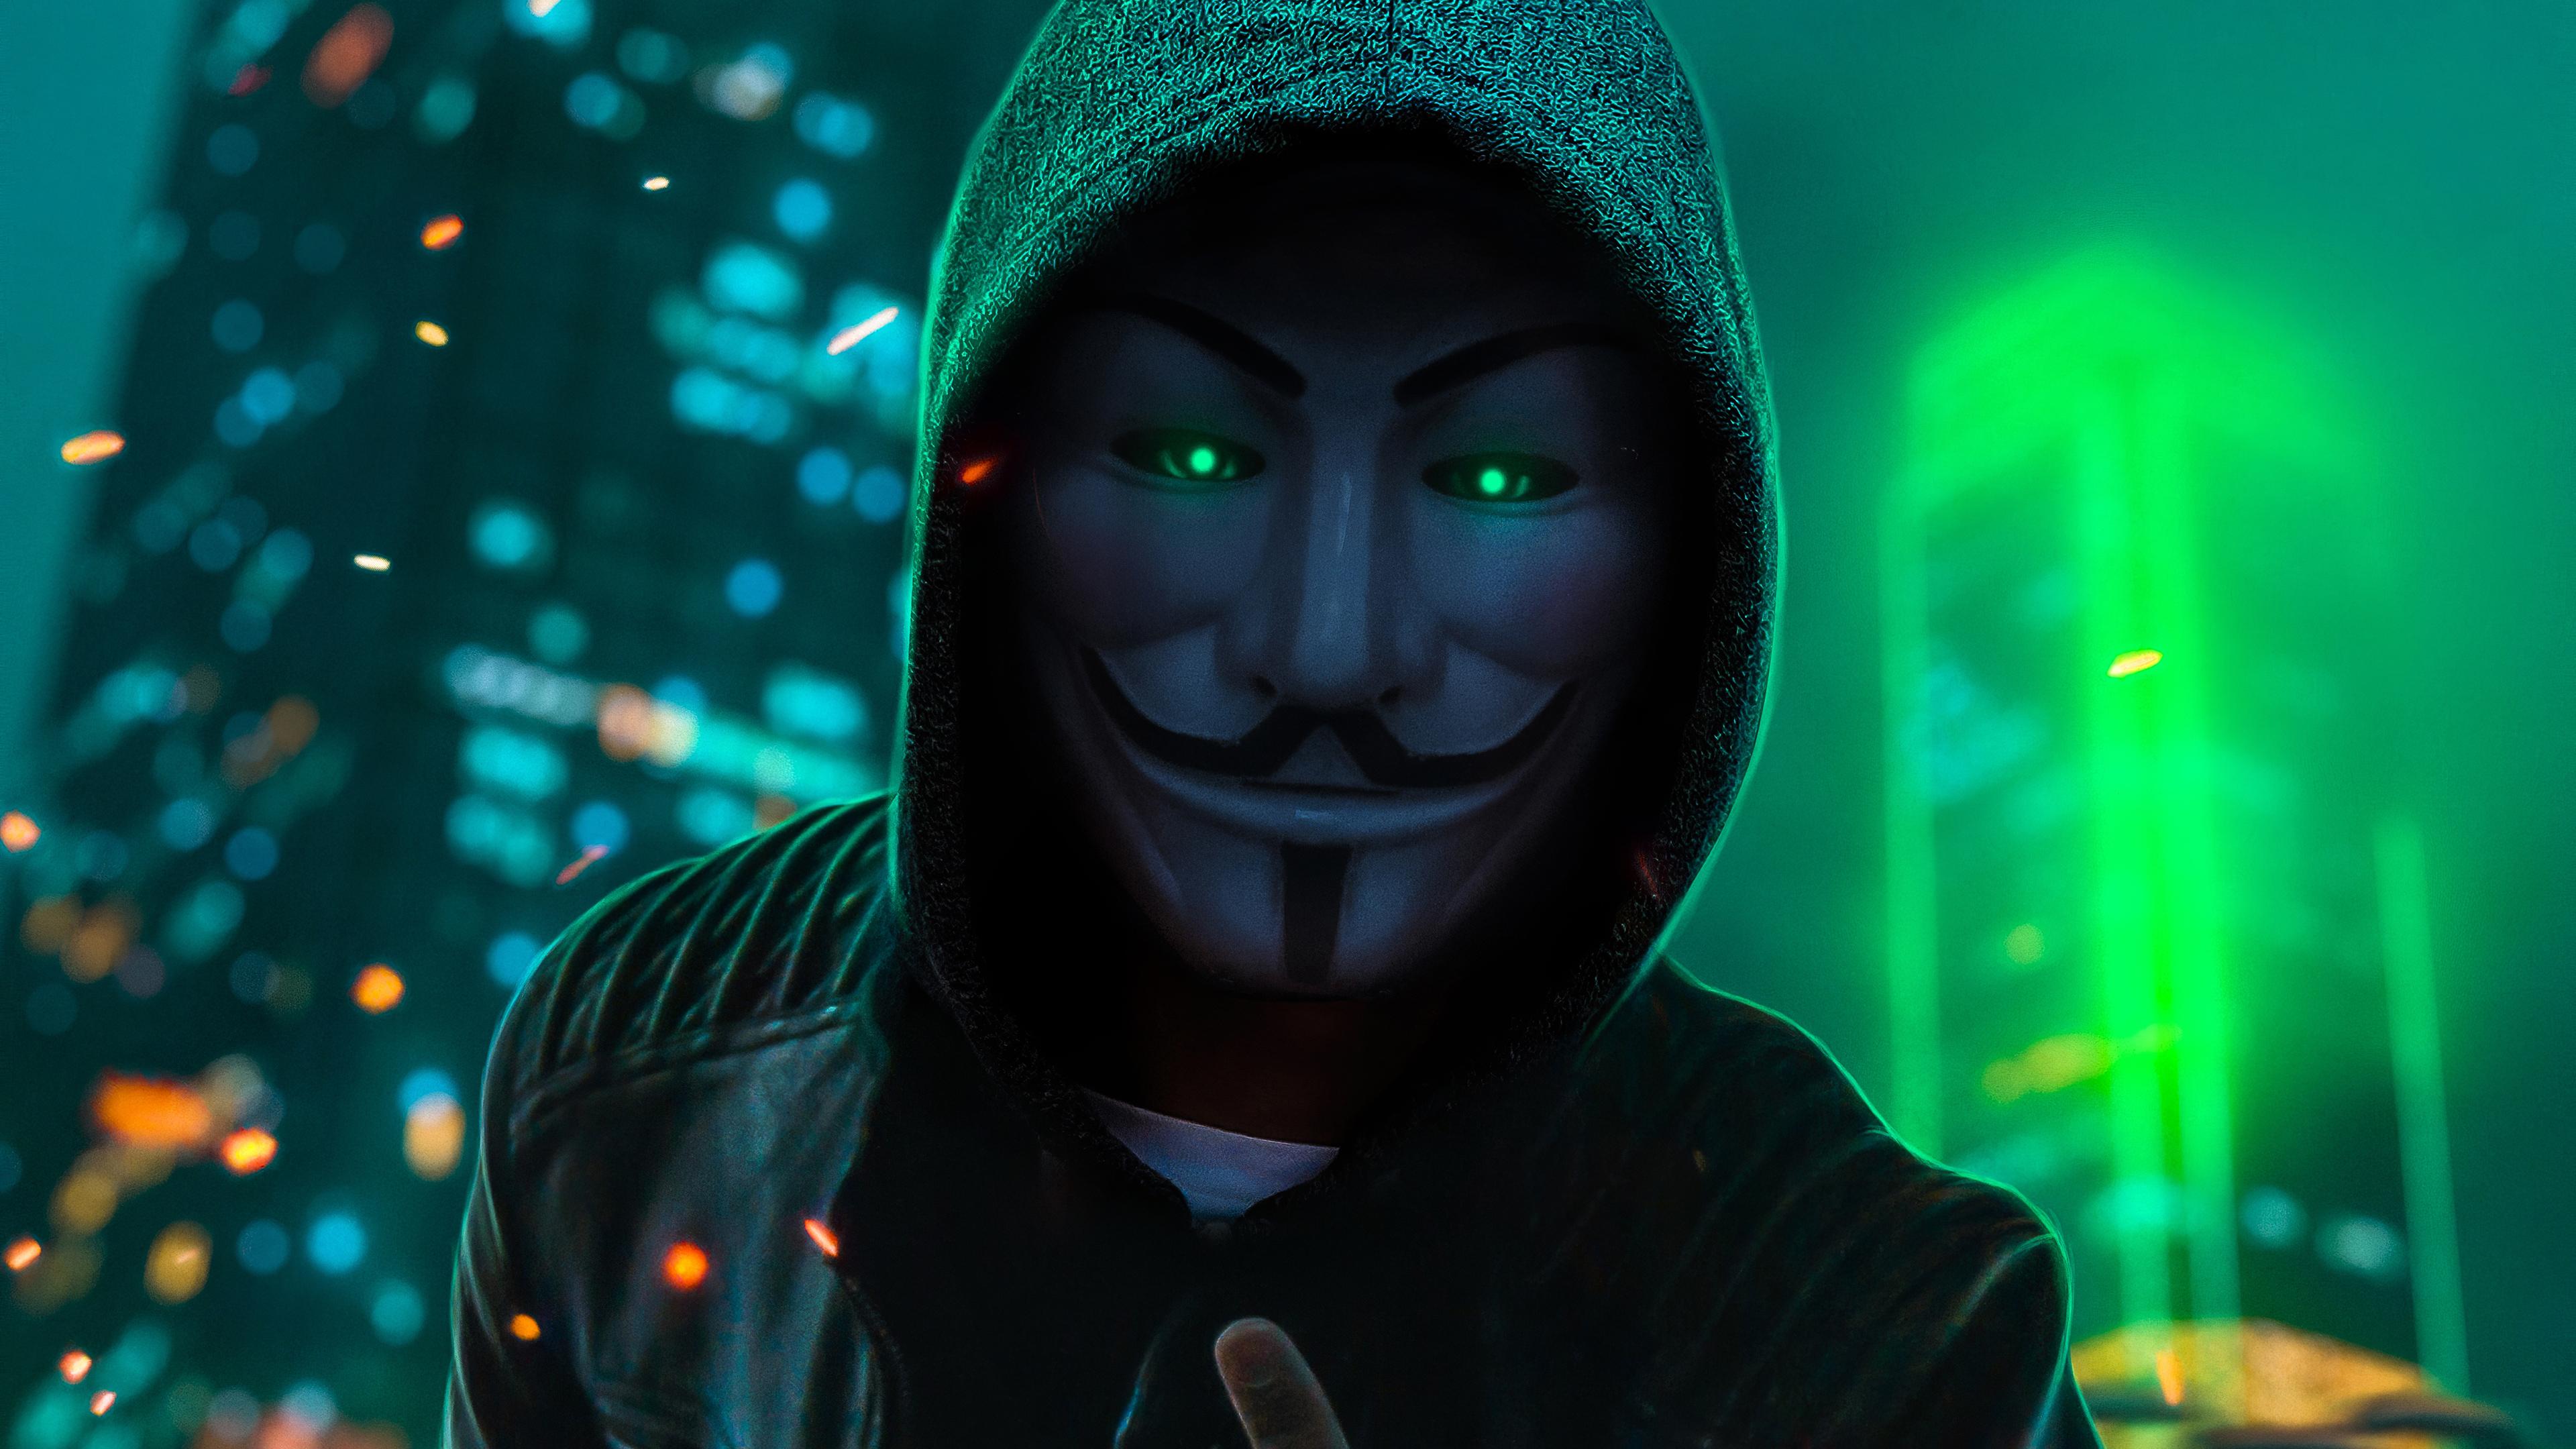 2932x2932 Anonymus Guy Glowing Eyes Green Neon 4k Ipad Pro Retina